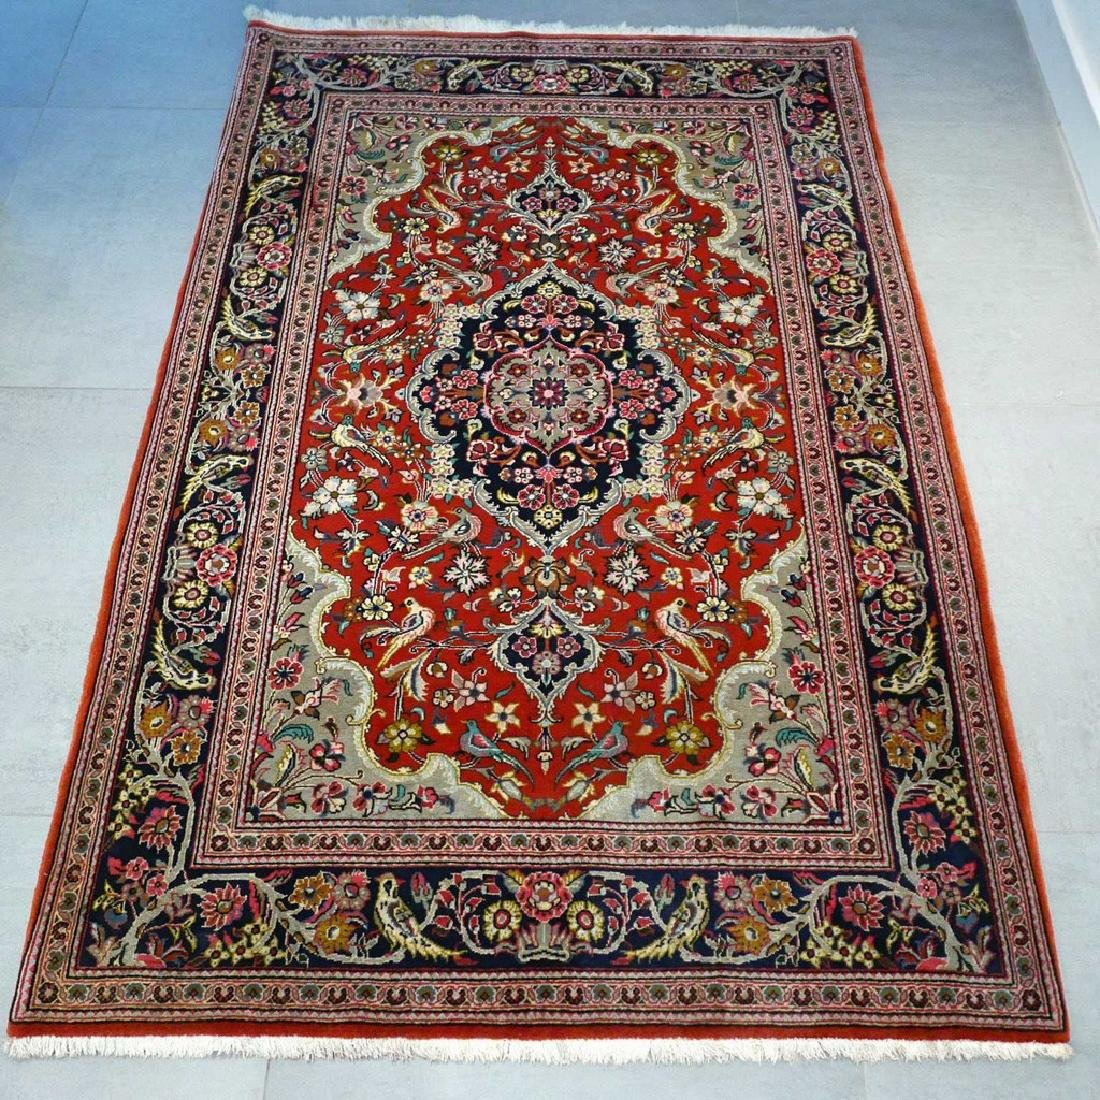 Qum Kork Wool on Cotton Rug 5.4x3.6